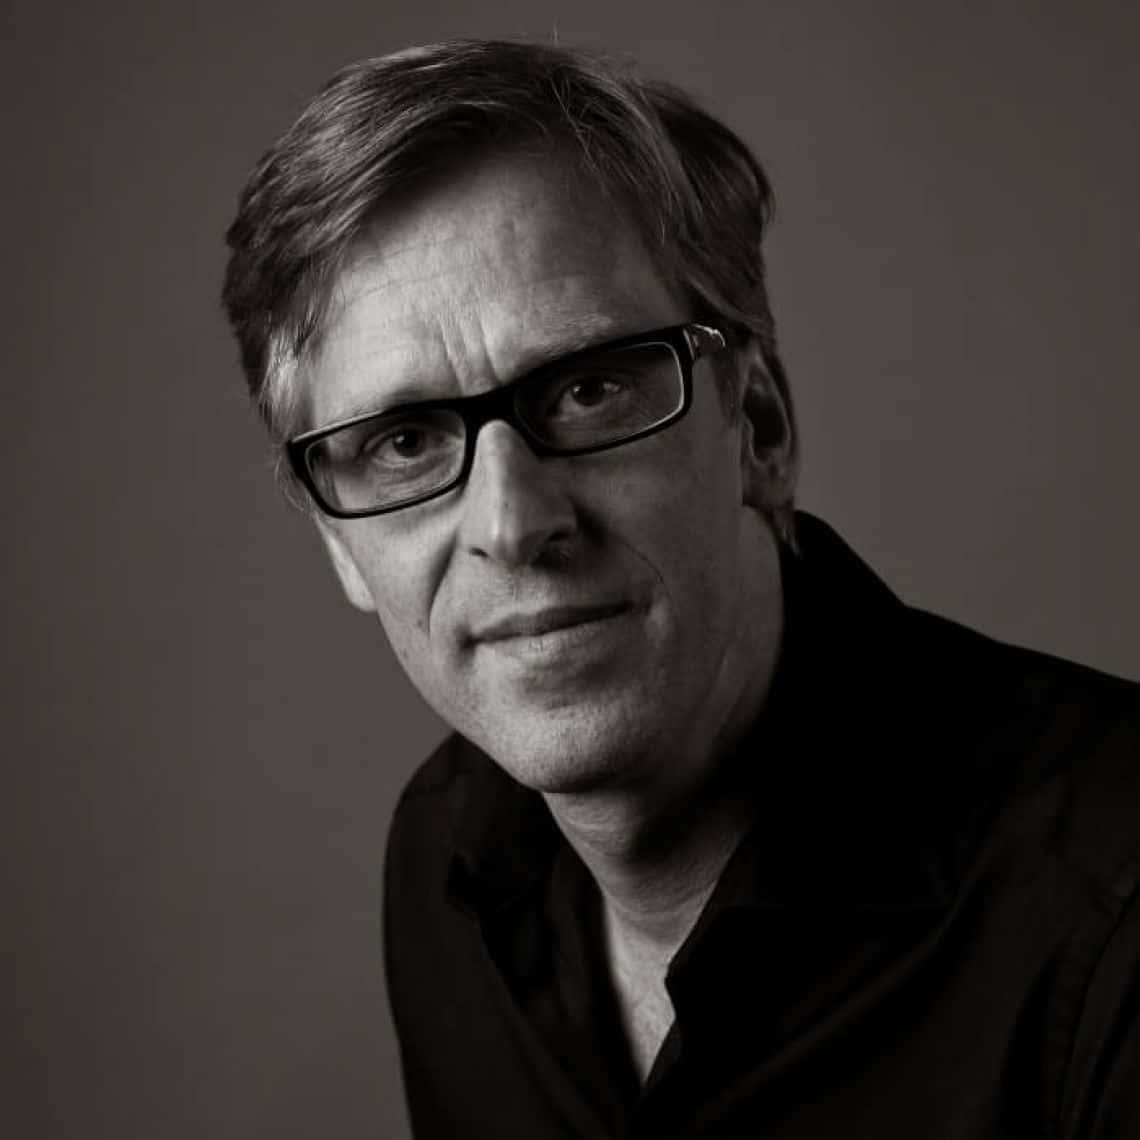 fredrik-haren-keynote-speaker